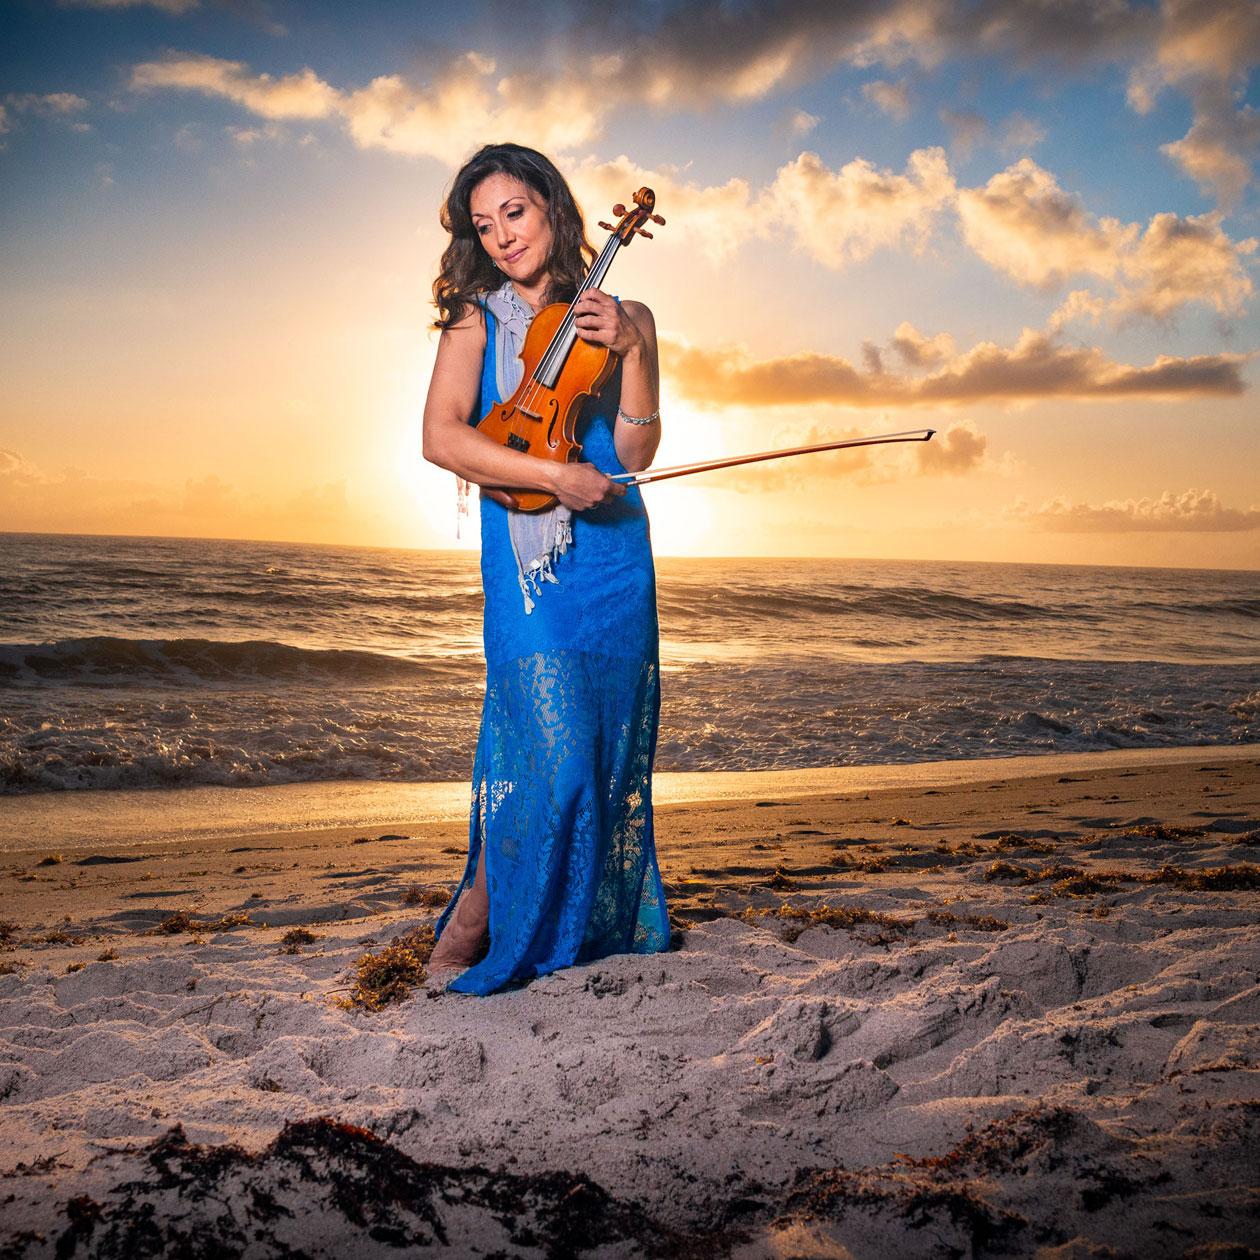 Mariana Sunset Violinist